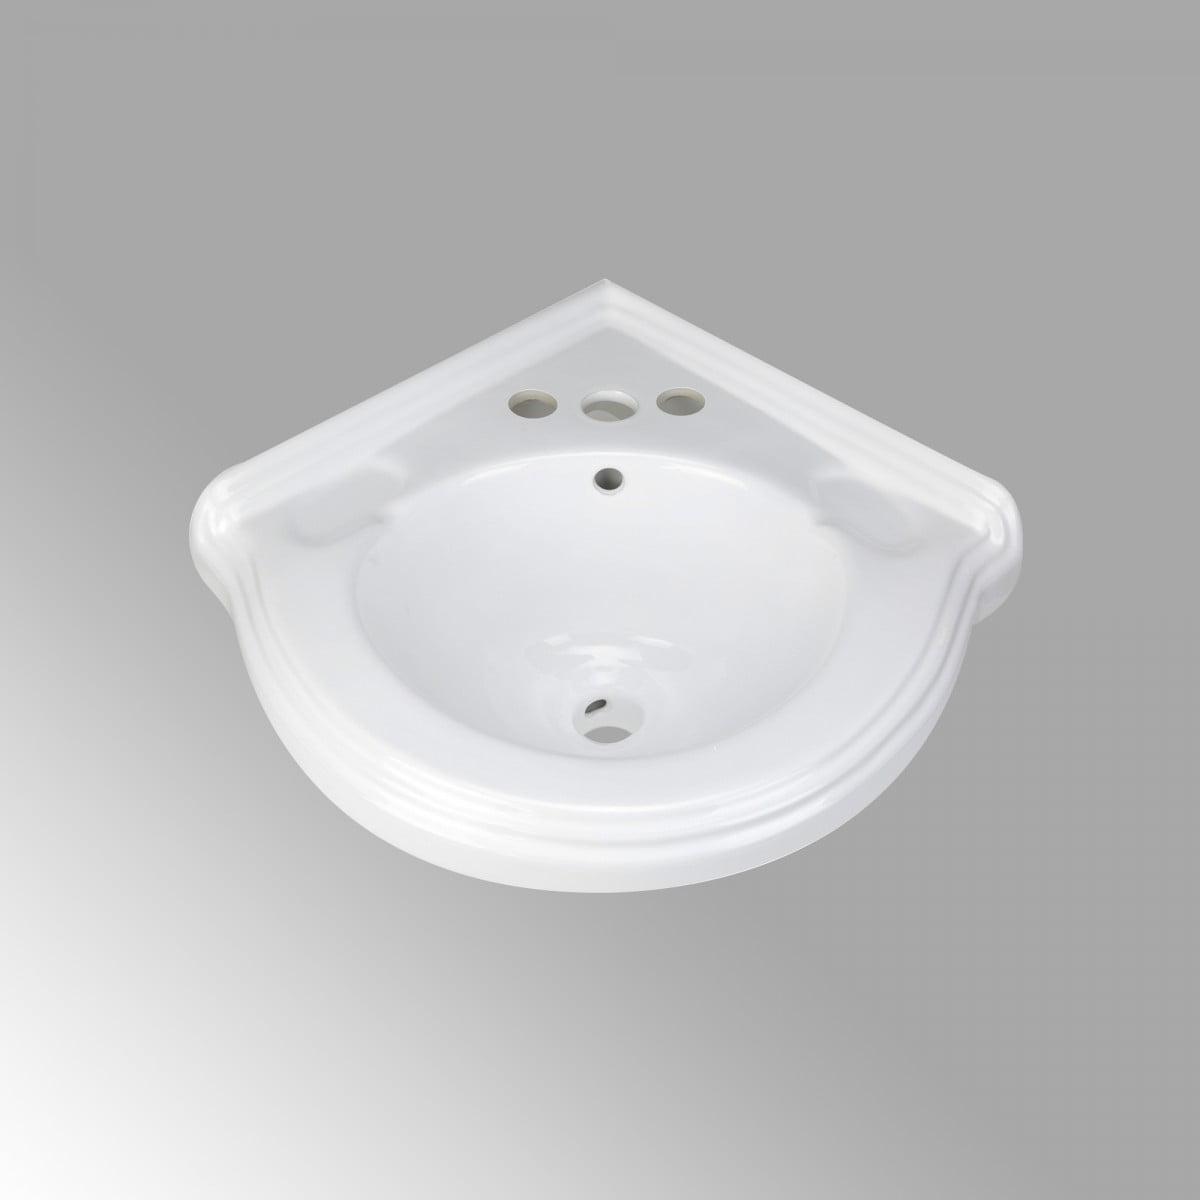 Renovator S Supply Portsmouth 22 Corner Wall Mounted Bathroom Sink In White With Overflow Walmart Com Walmart Com